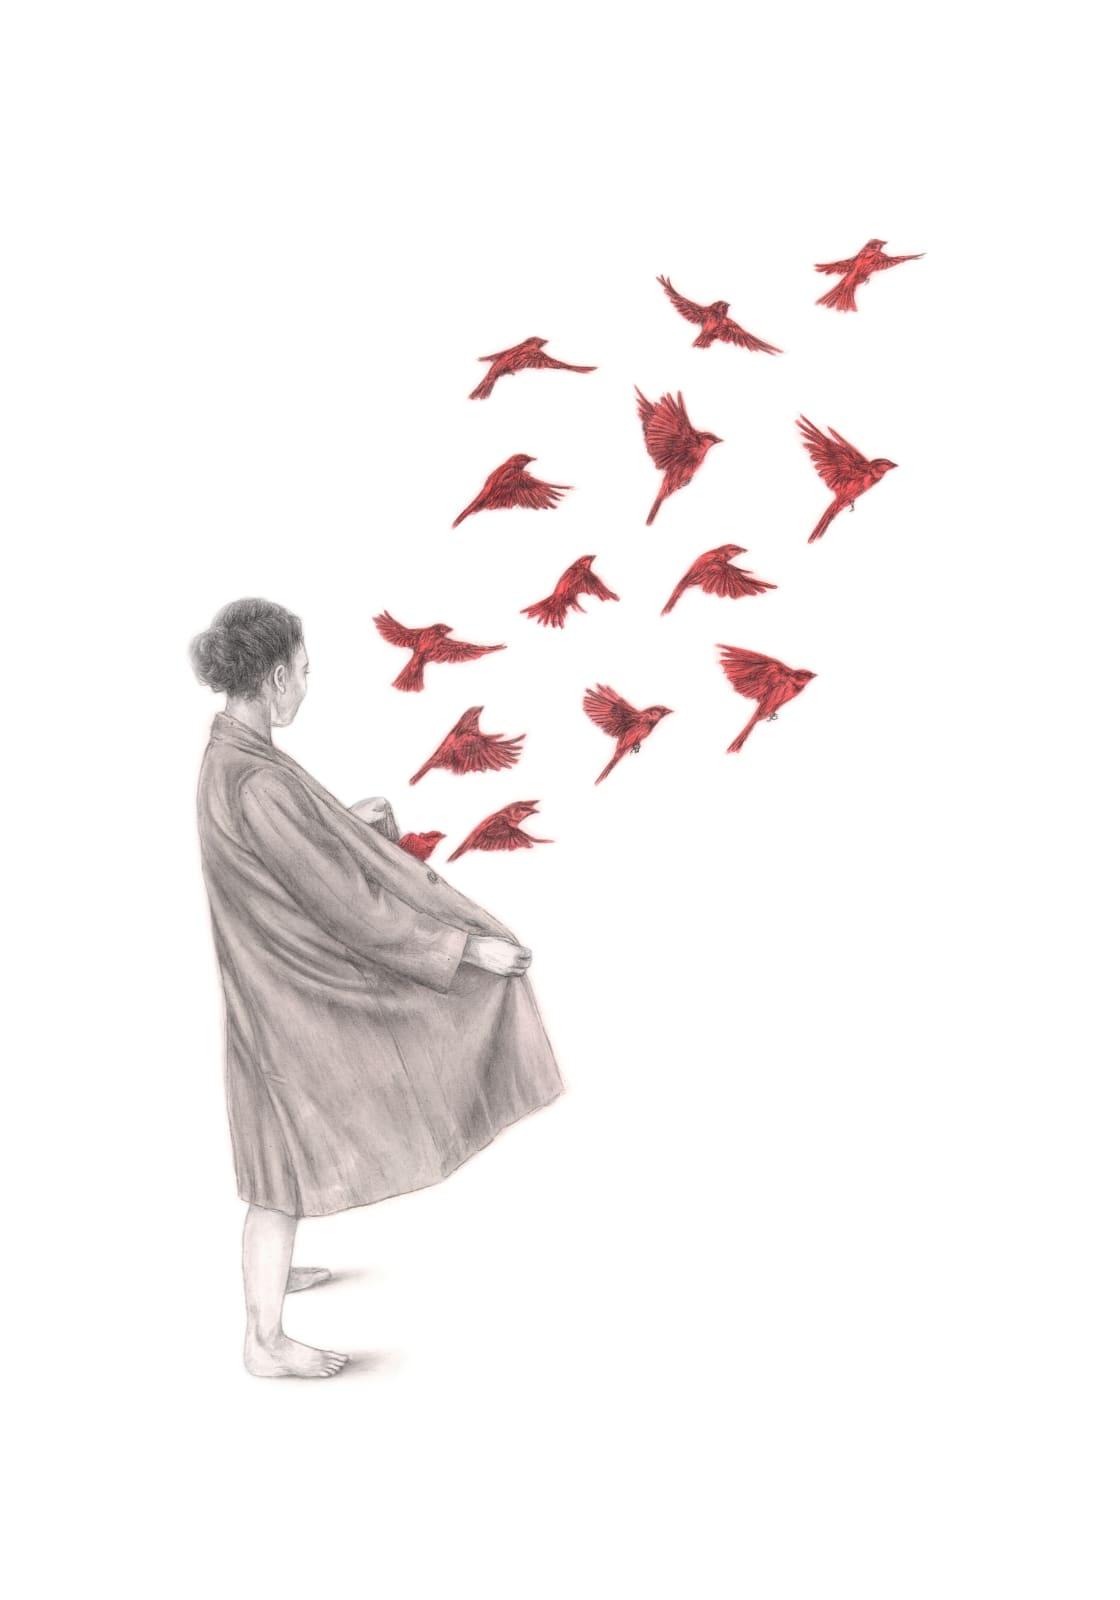 Rachel Goodyear, Release, 2021